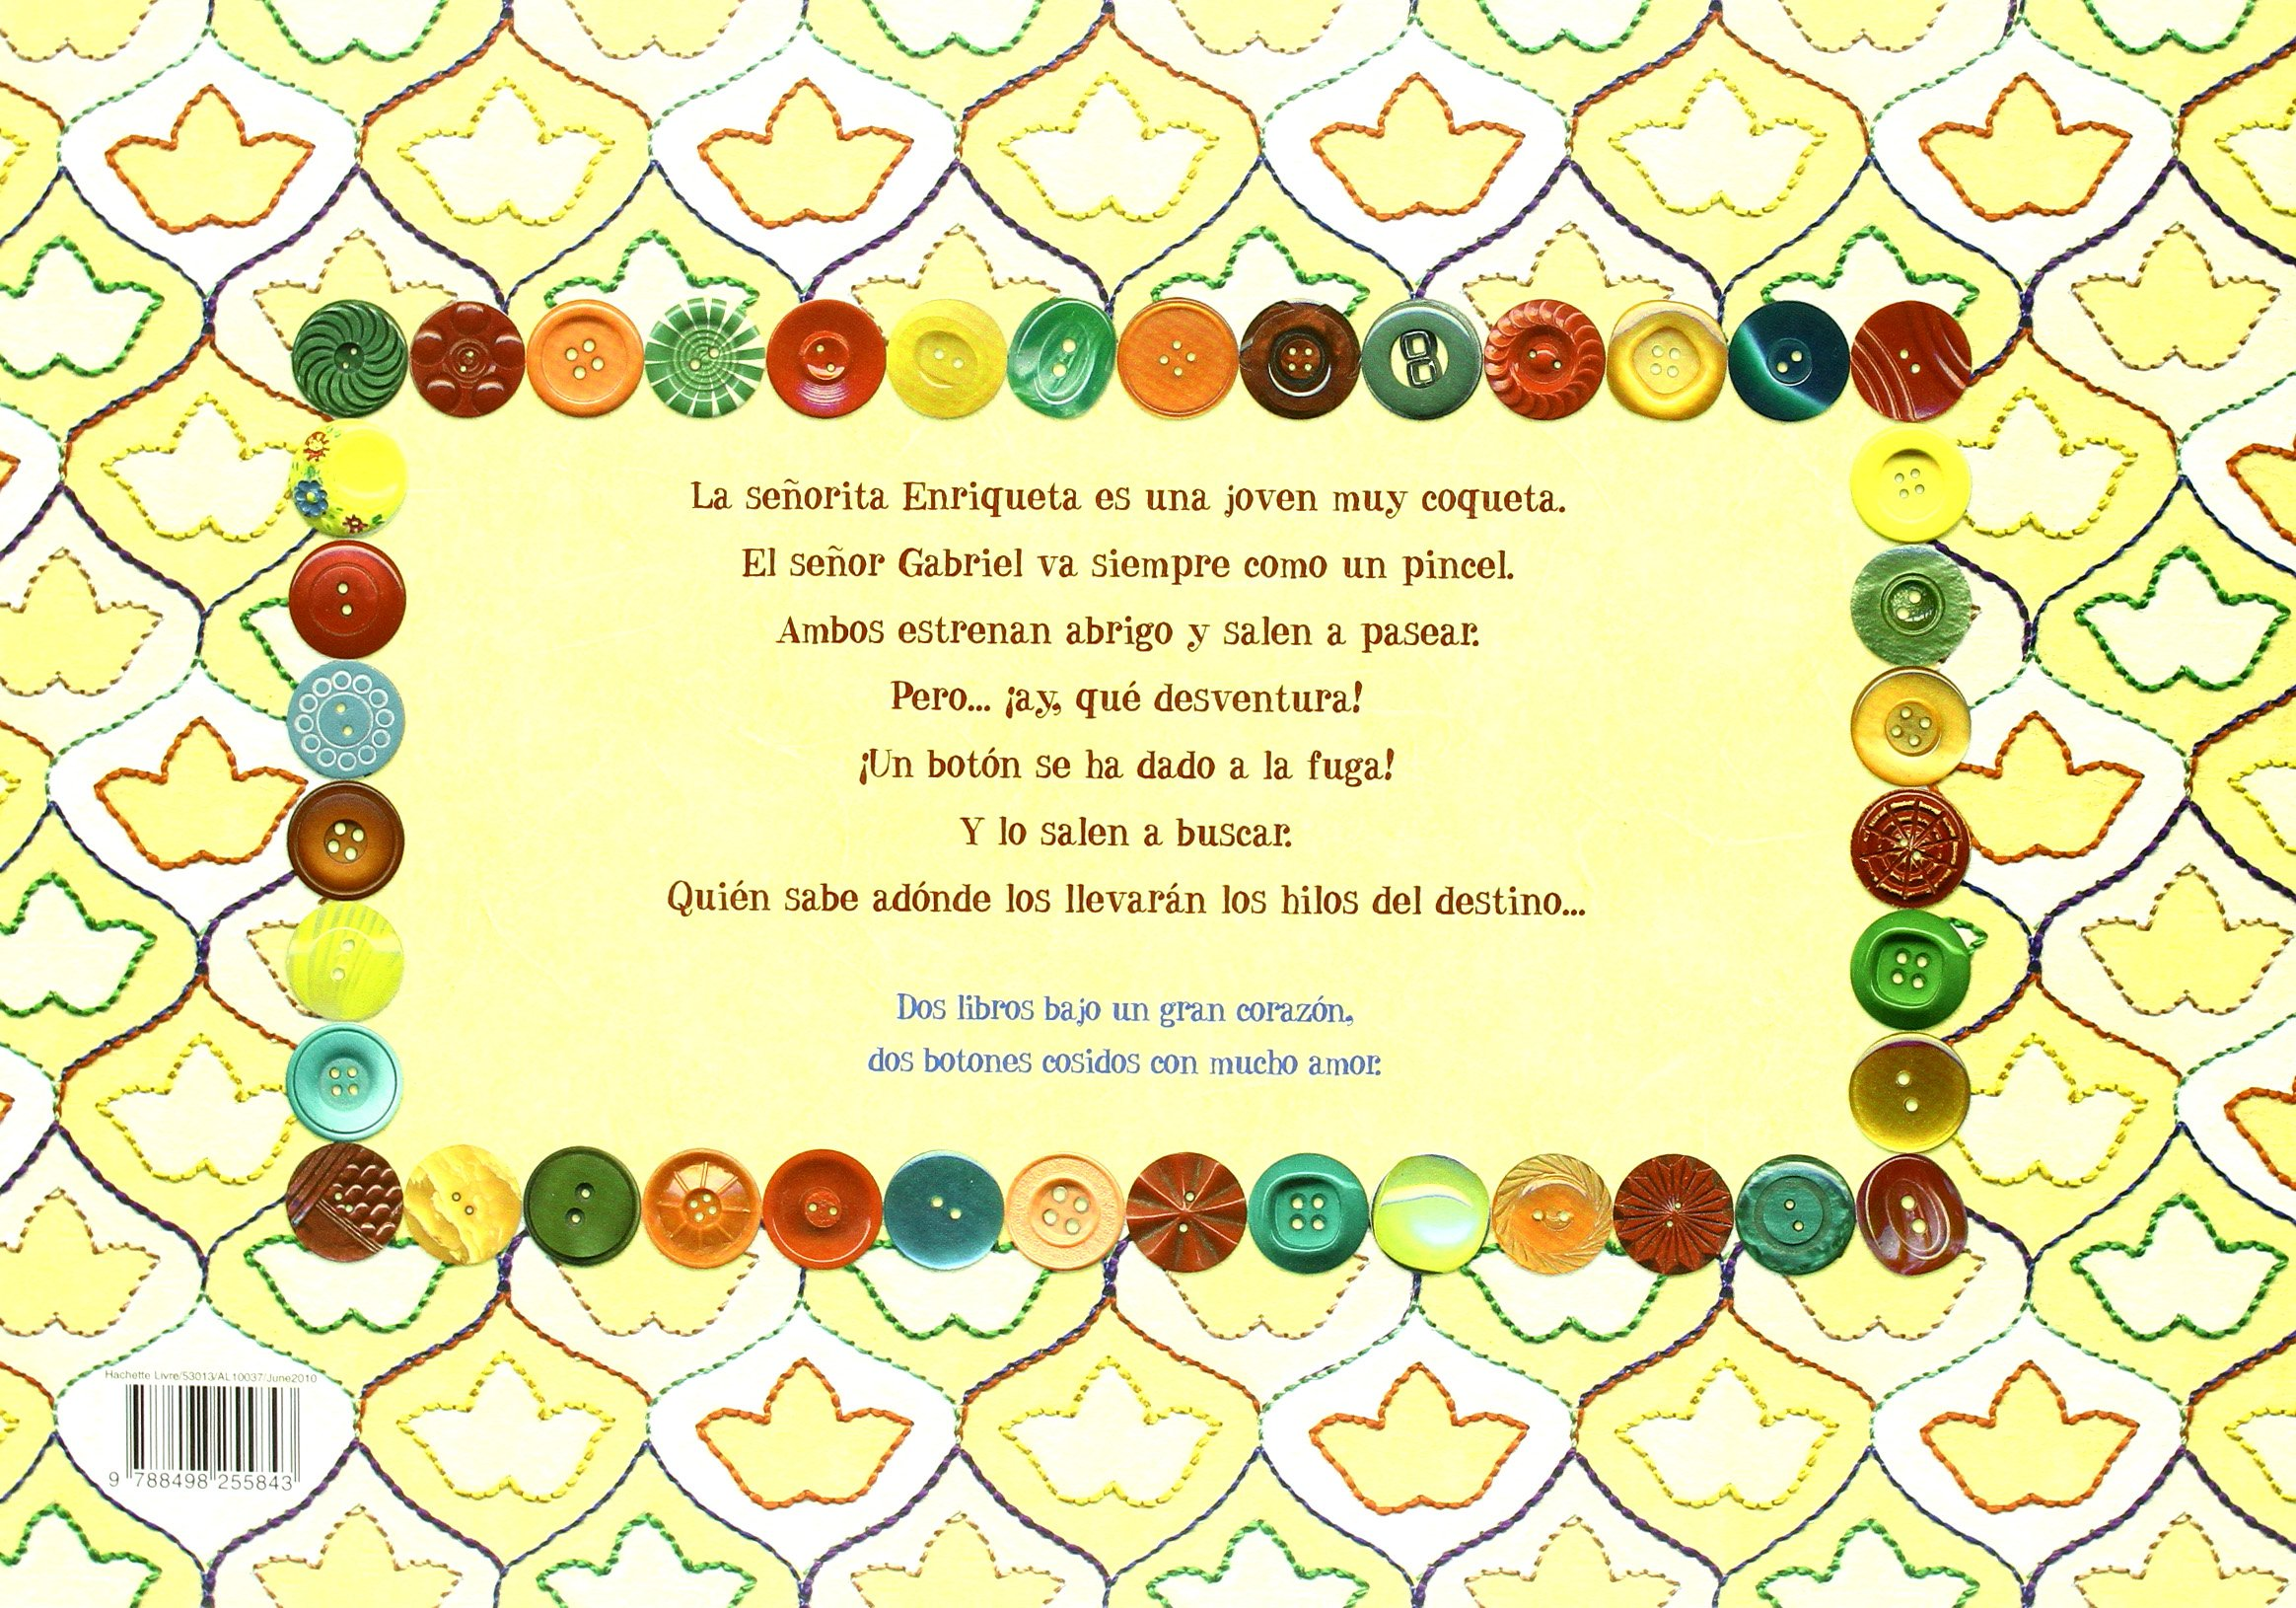 Amazon.com: Un amor de botón (Spanish Edition) (9788498255843): Pauline Carlioz: Books